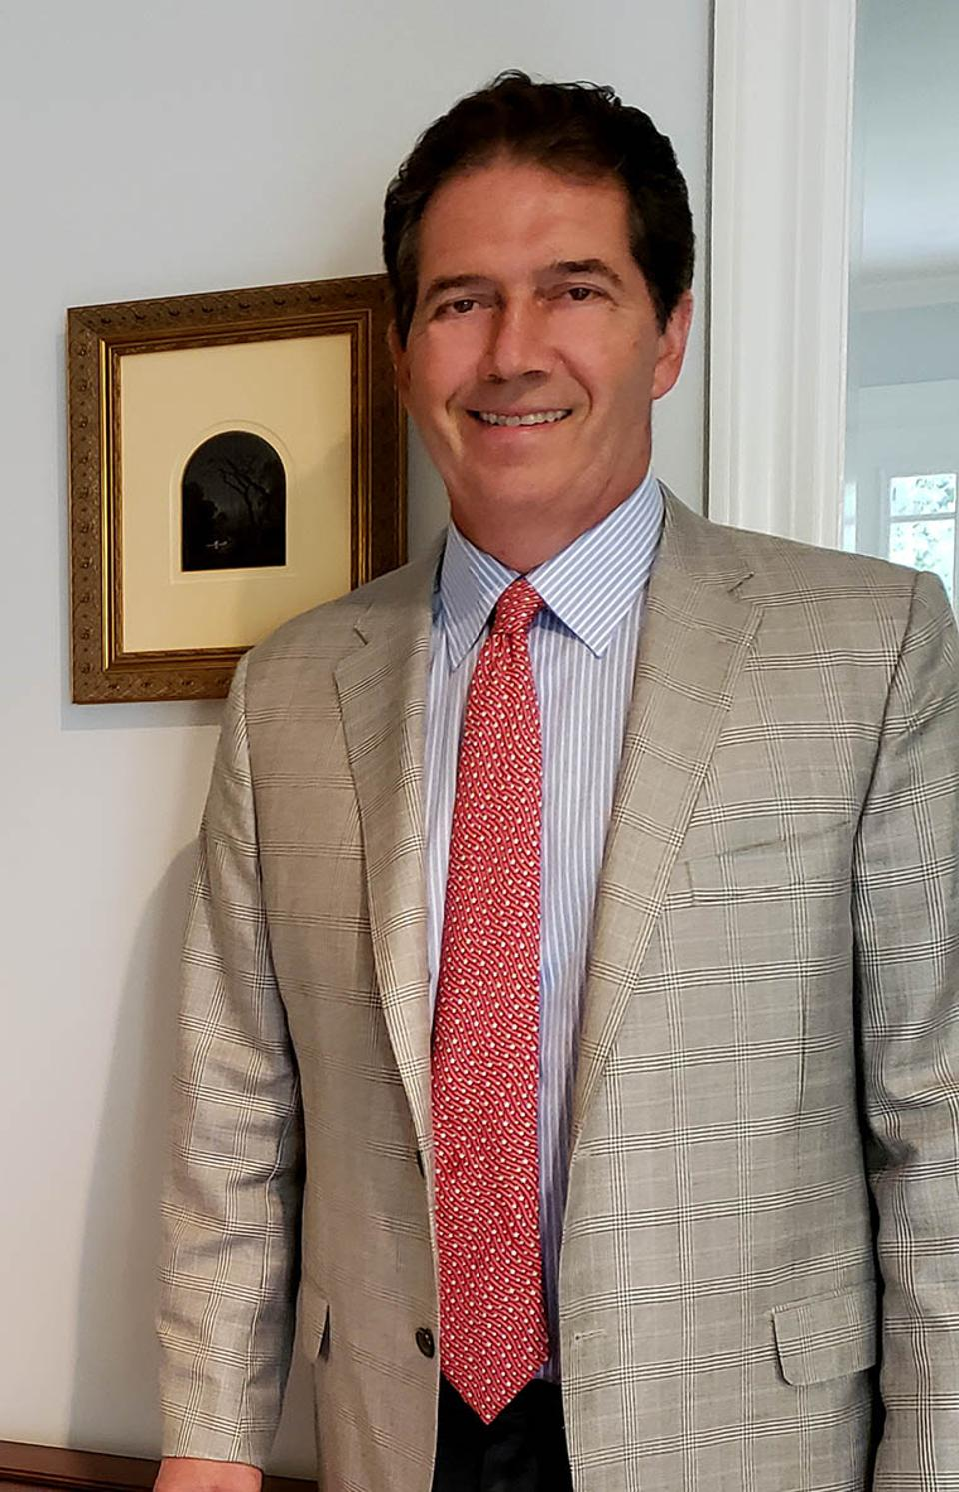 Head shot of Anthony Speiser, Jasper F. Cropsey expert